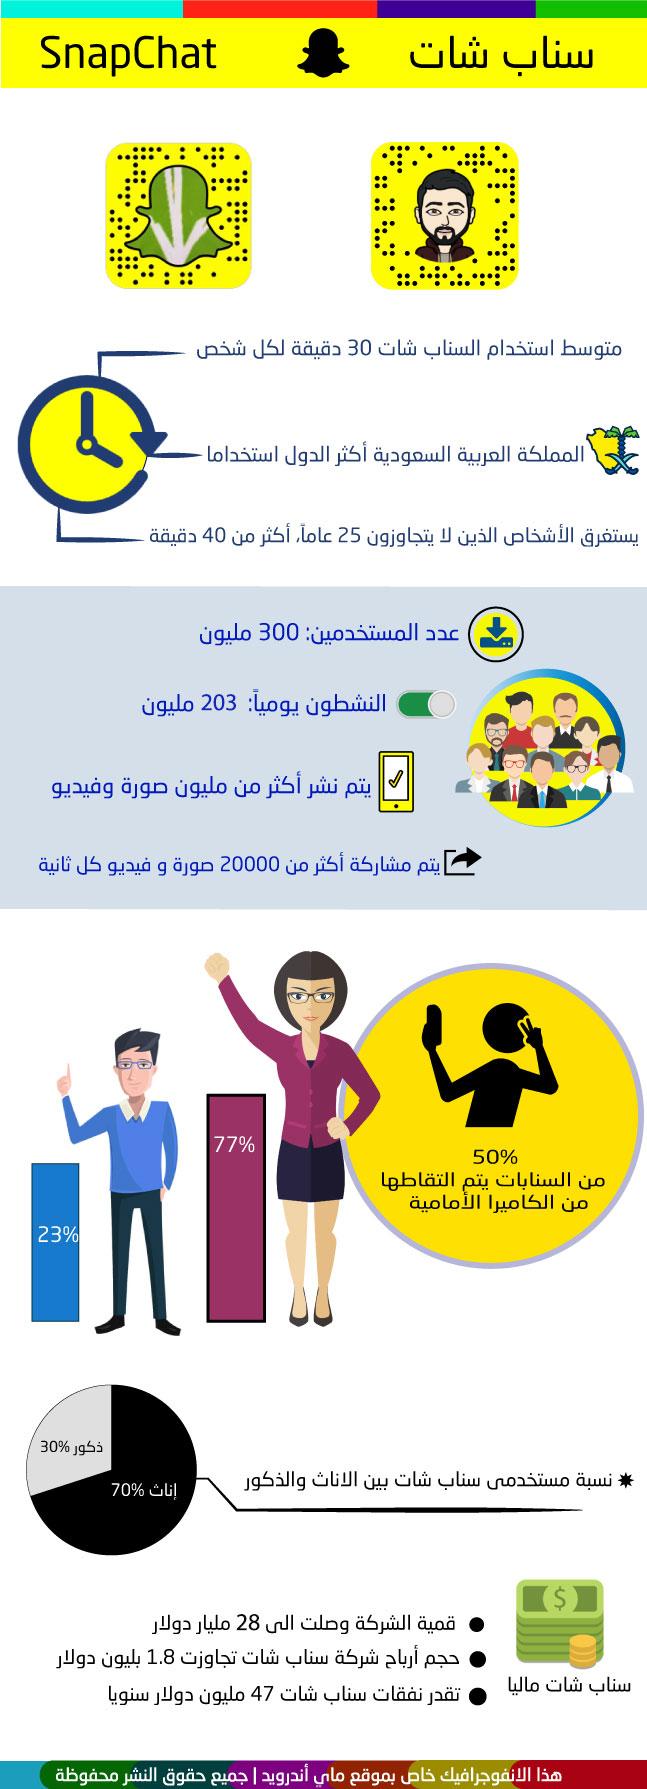 انفوجرافيك معلومات سناب شات infographic snapchat